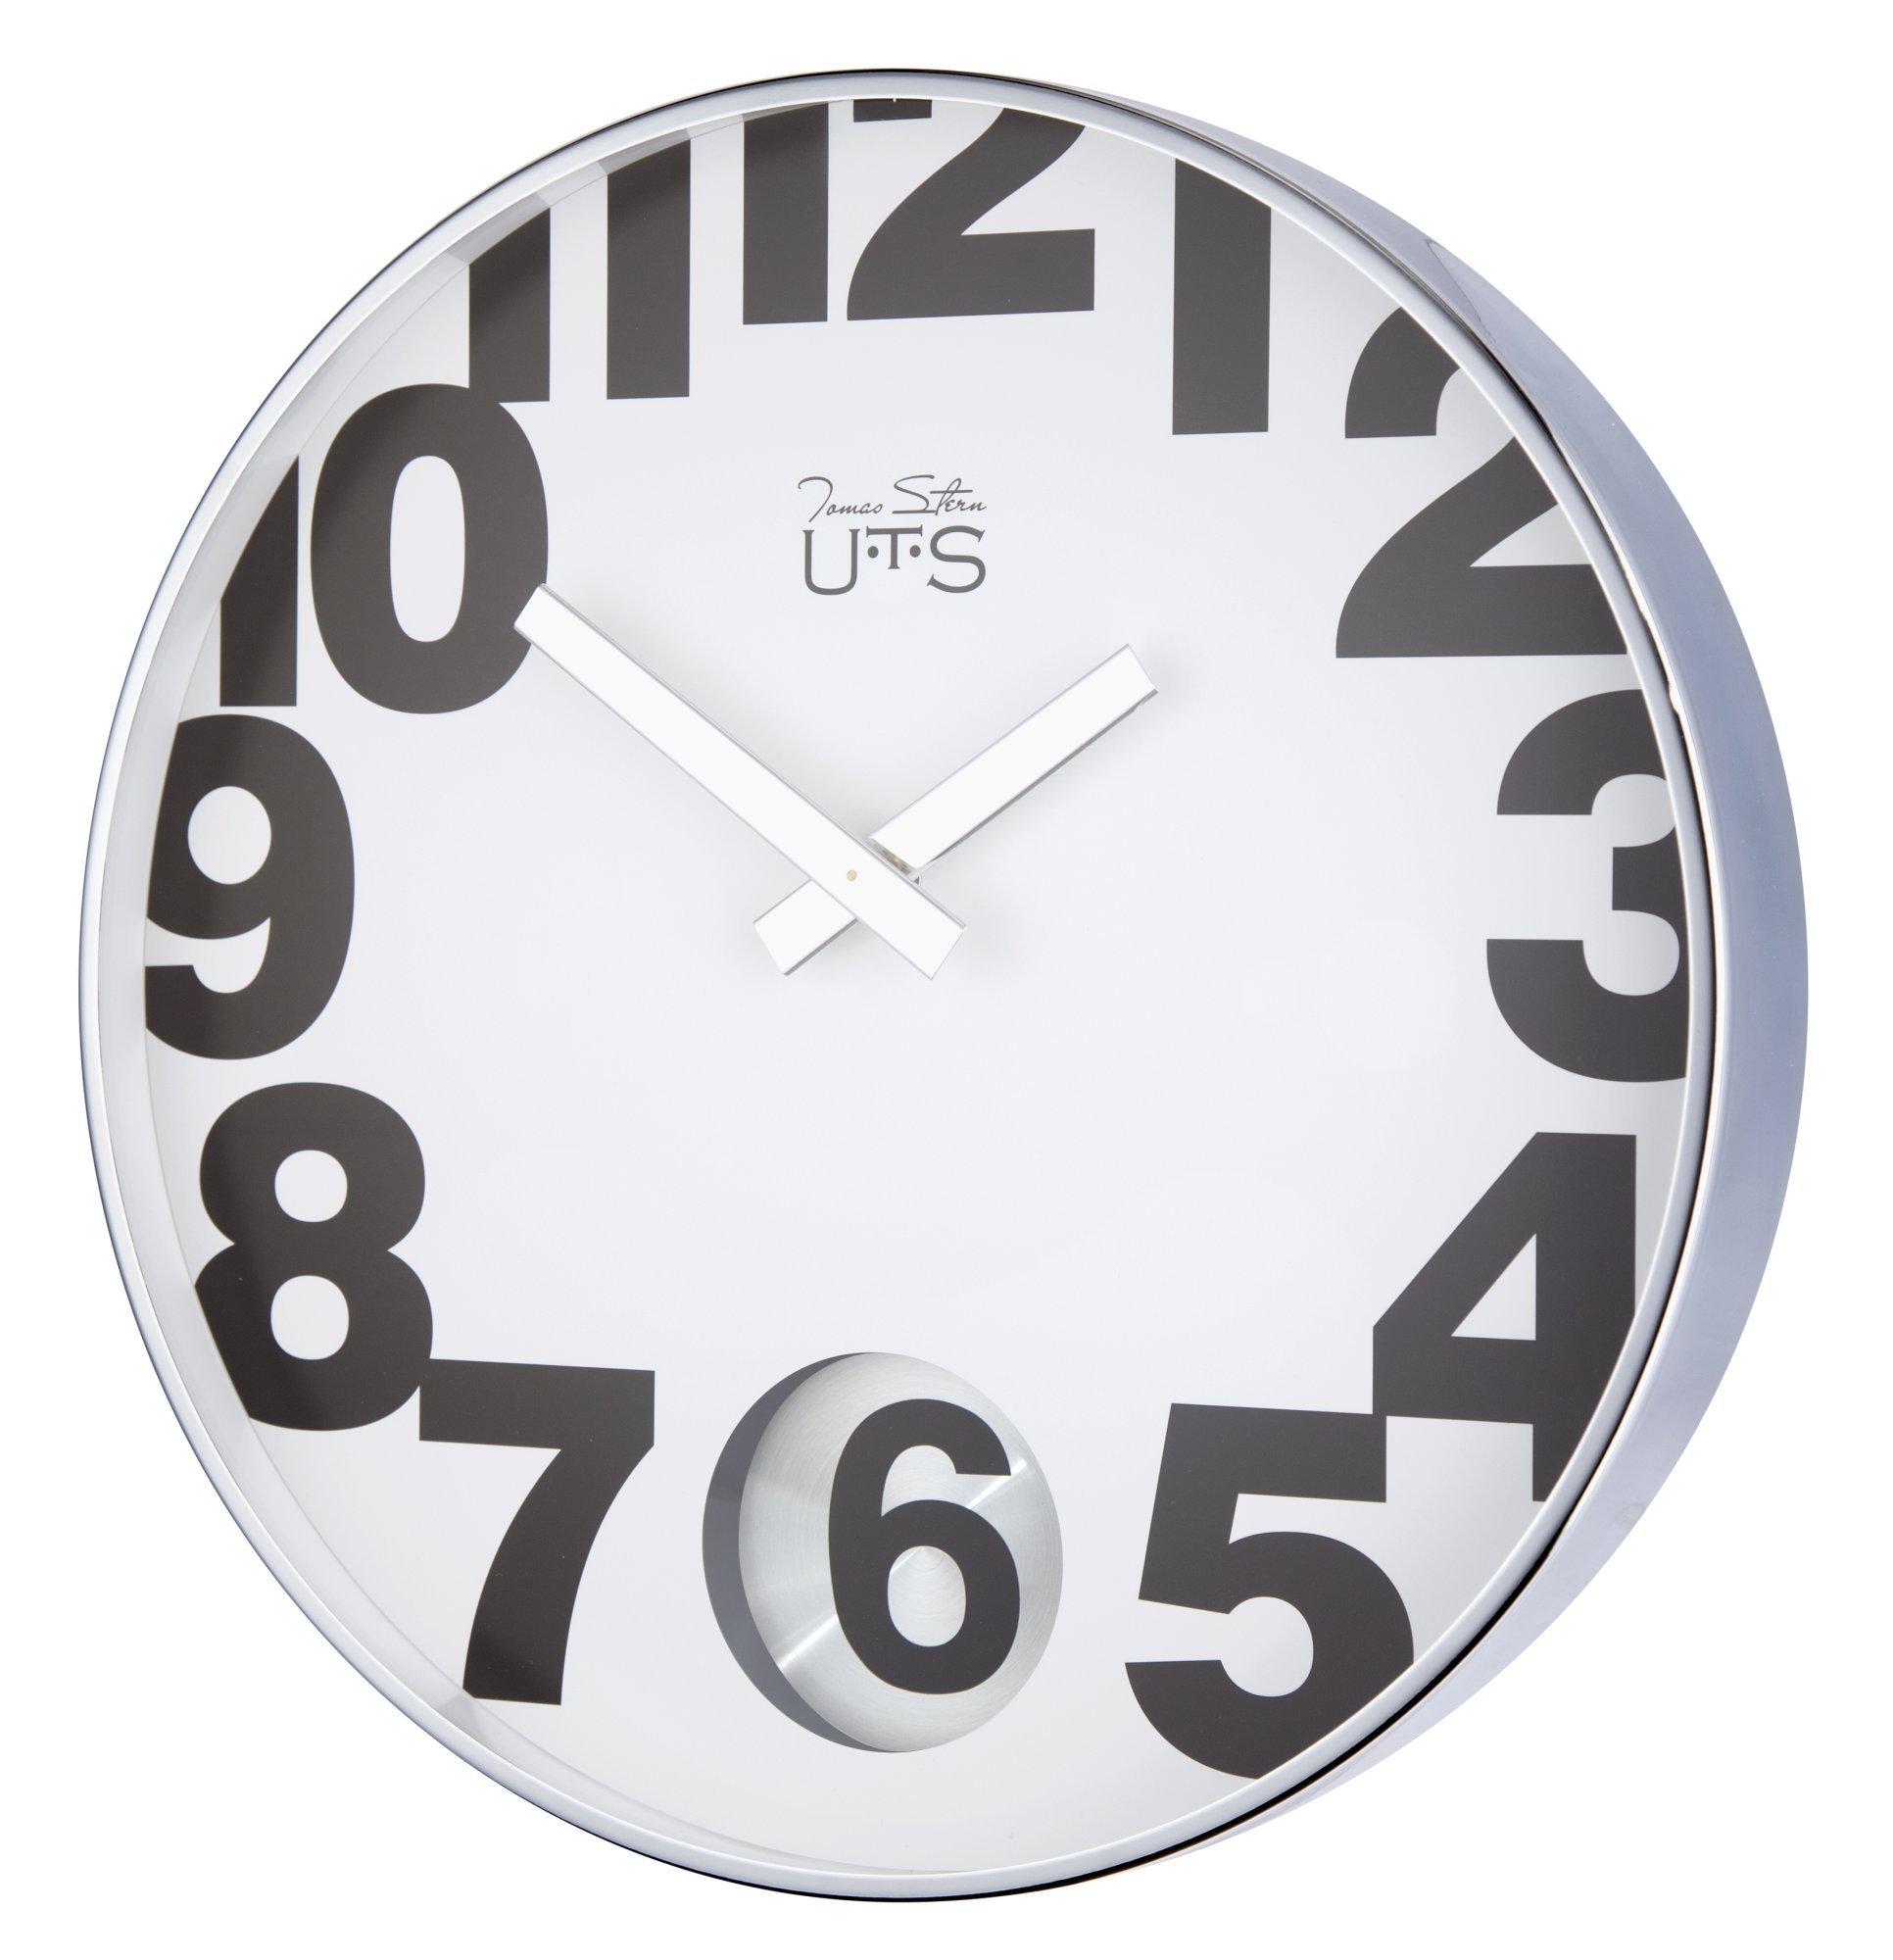 Часы настенные Часы настенные Tomas Stern 4003S chasy-nastennye-tomas-stern-4003s-germaniya.jpg